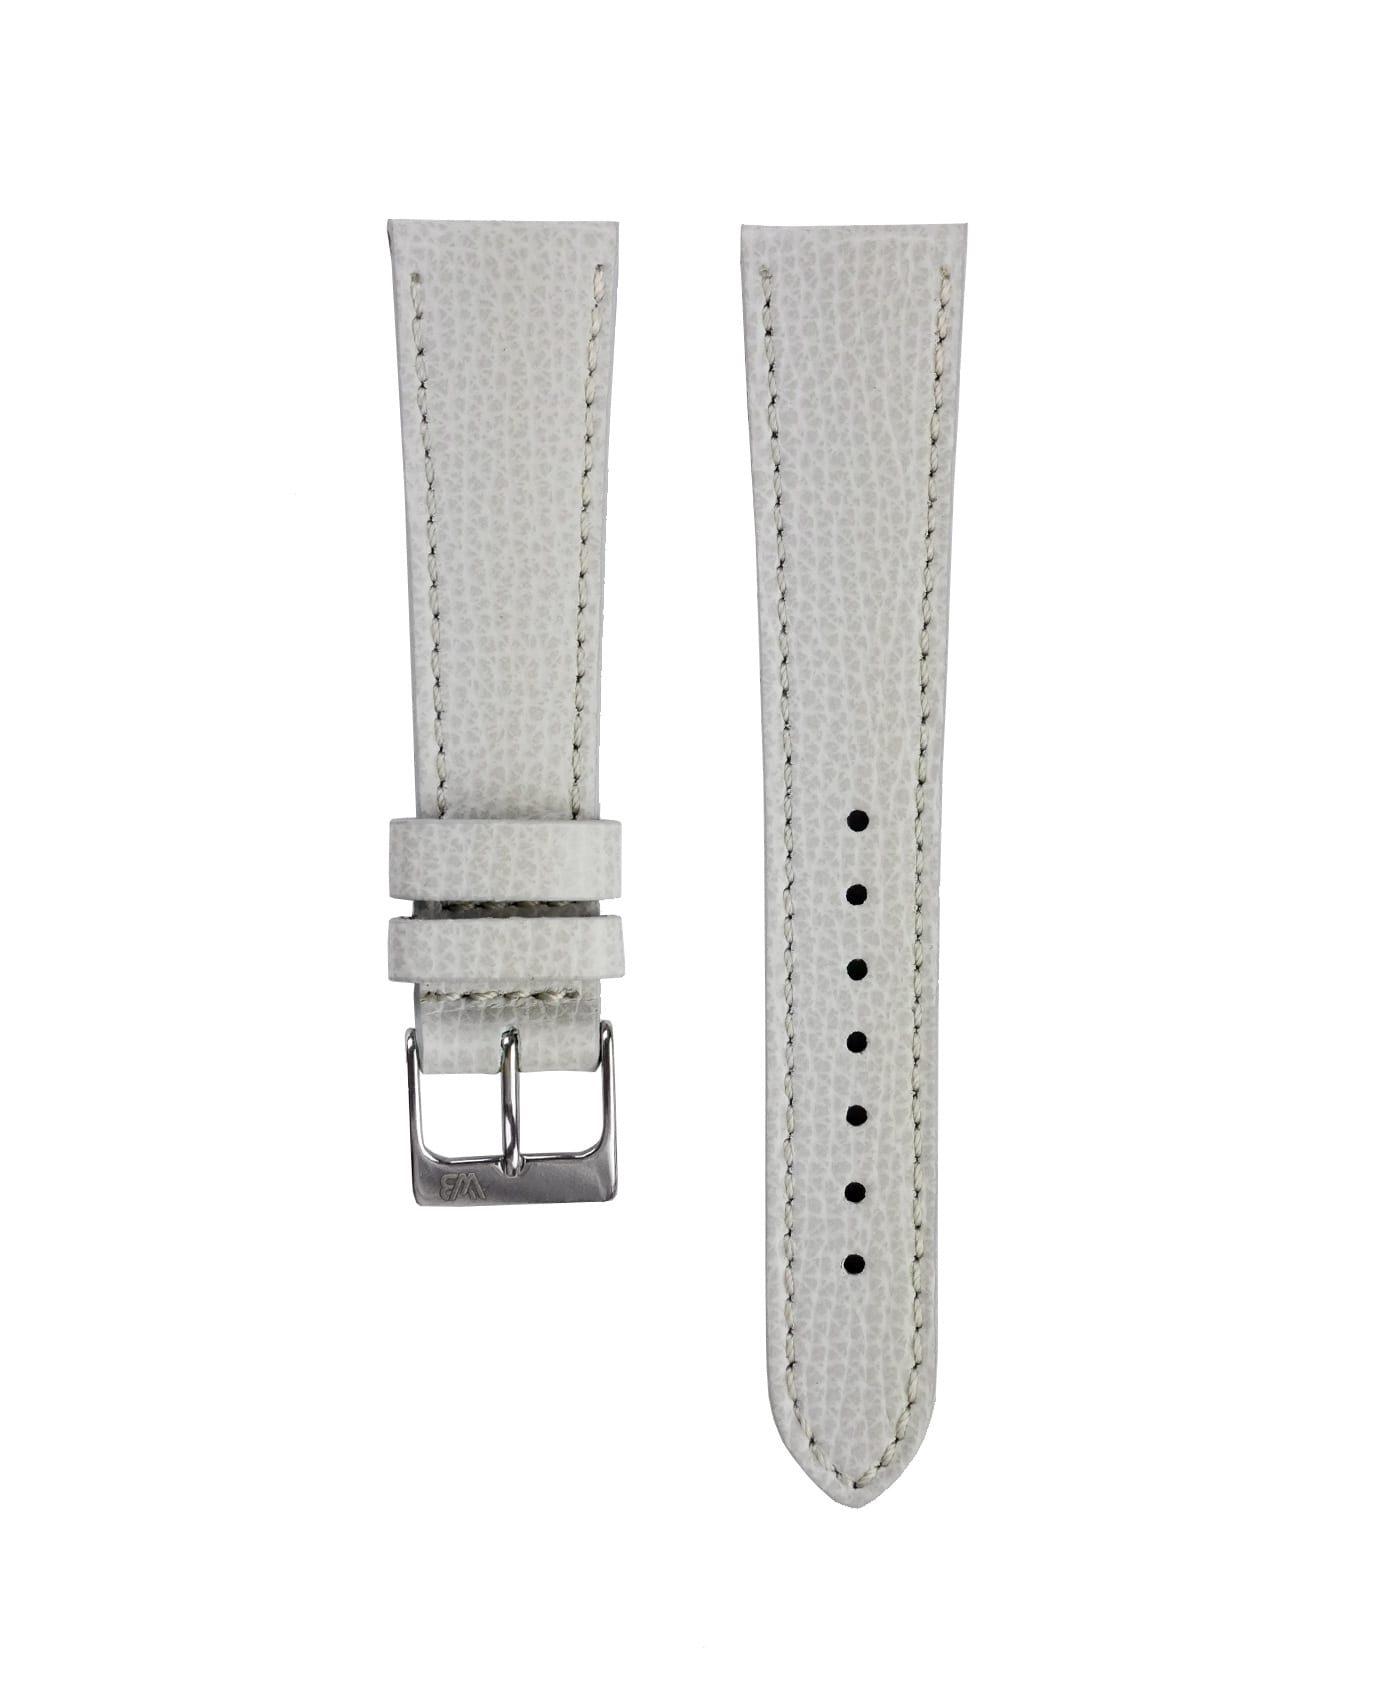 Textured calfskin leather watch strap light grey front watchbandit